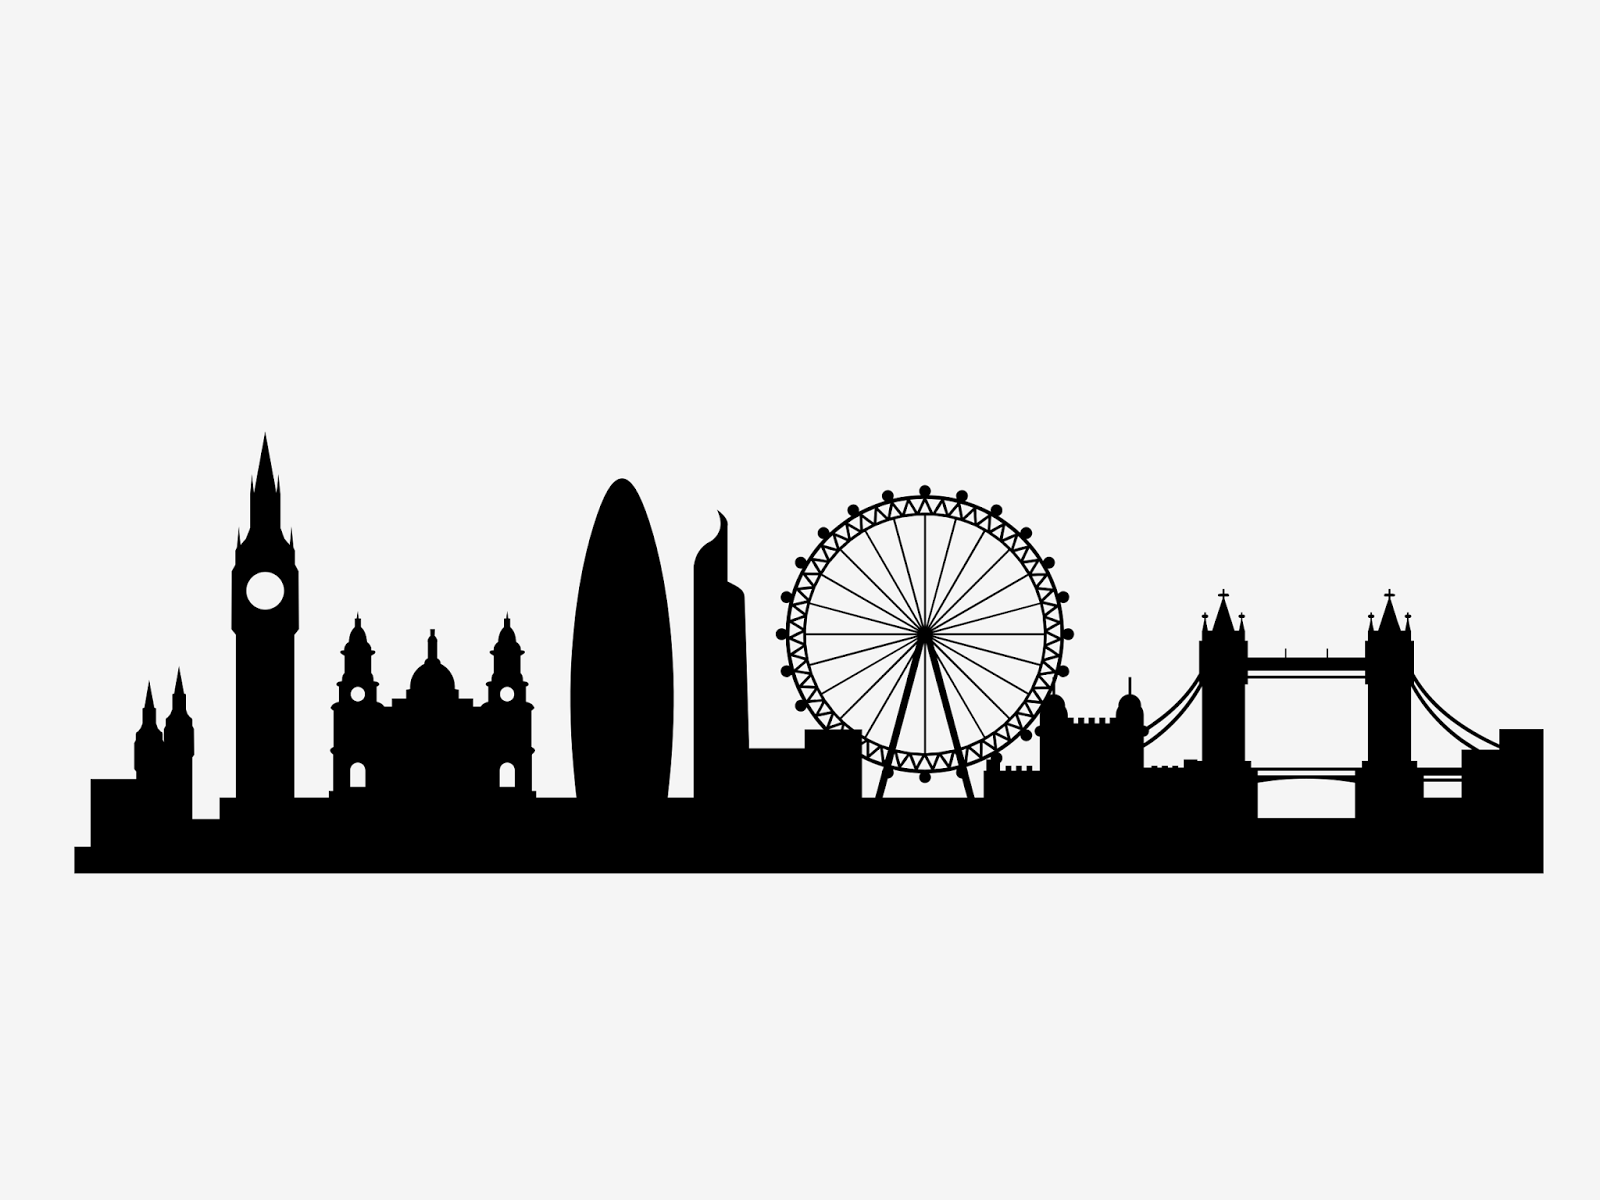 Silloette Of London Skyline London City Skyline Svg London Skyline Silhouette London Skyline Tattoo London Drawing